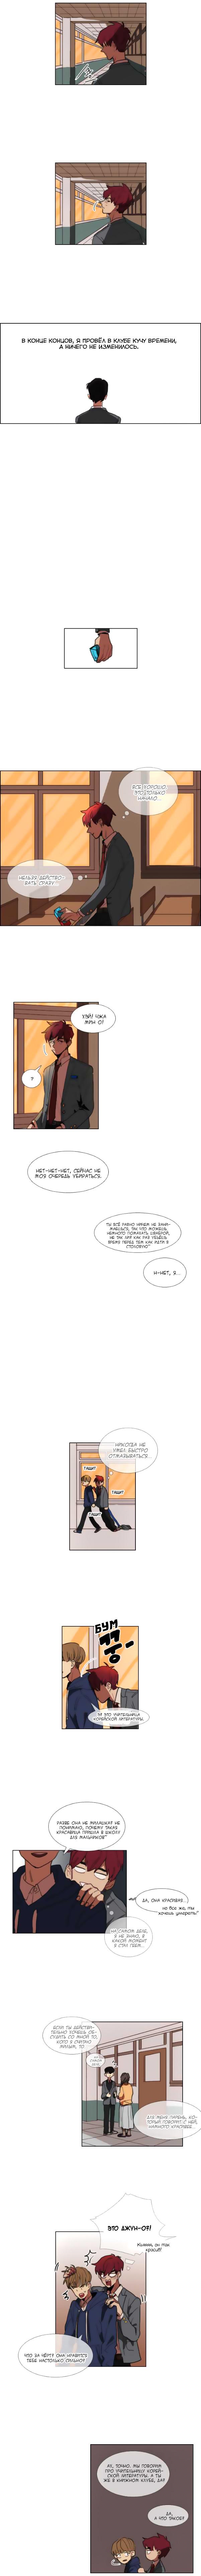 https://r1.ninemanga.com/comics/pic2/27/31131/409987/1519639507752.jpg Page 4